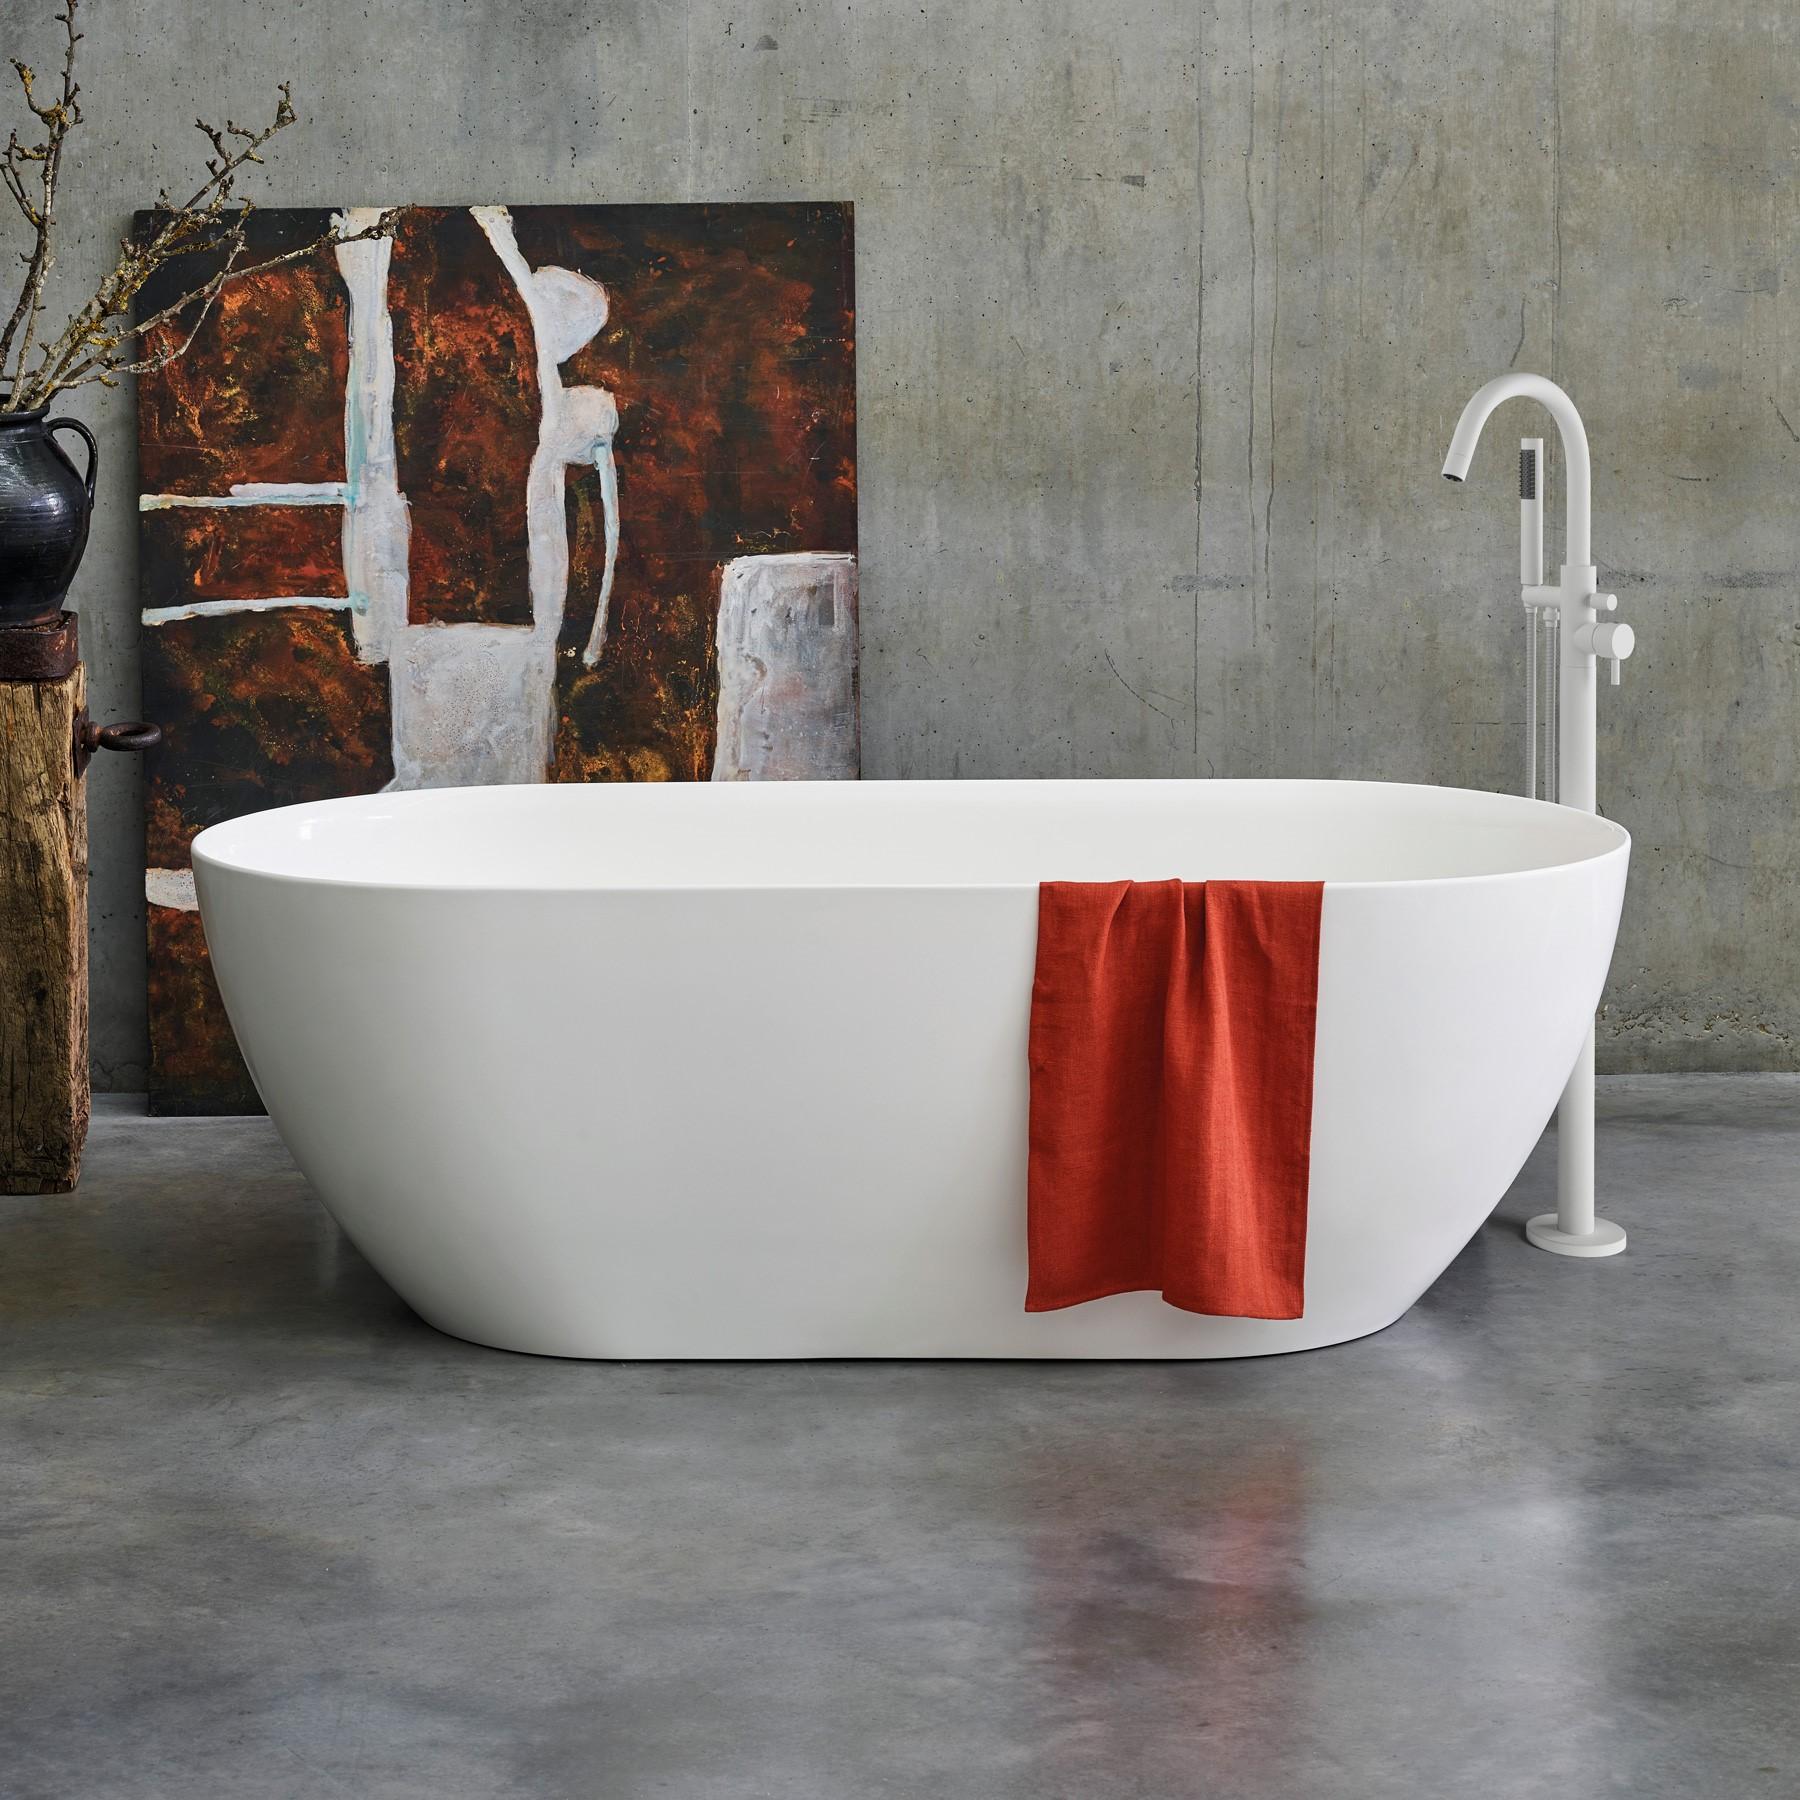 MPRO Petite Bath